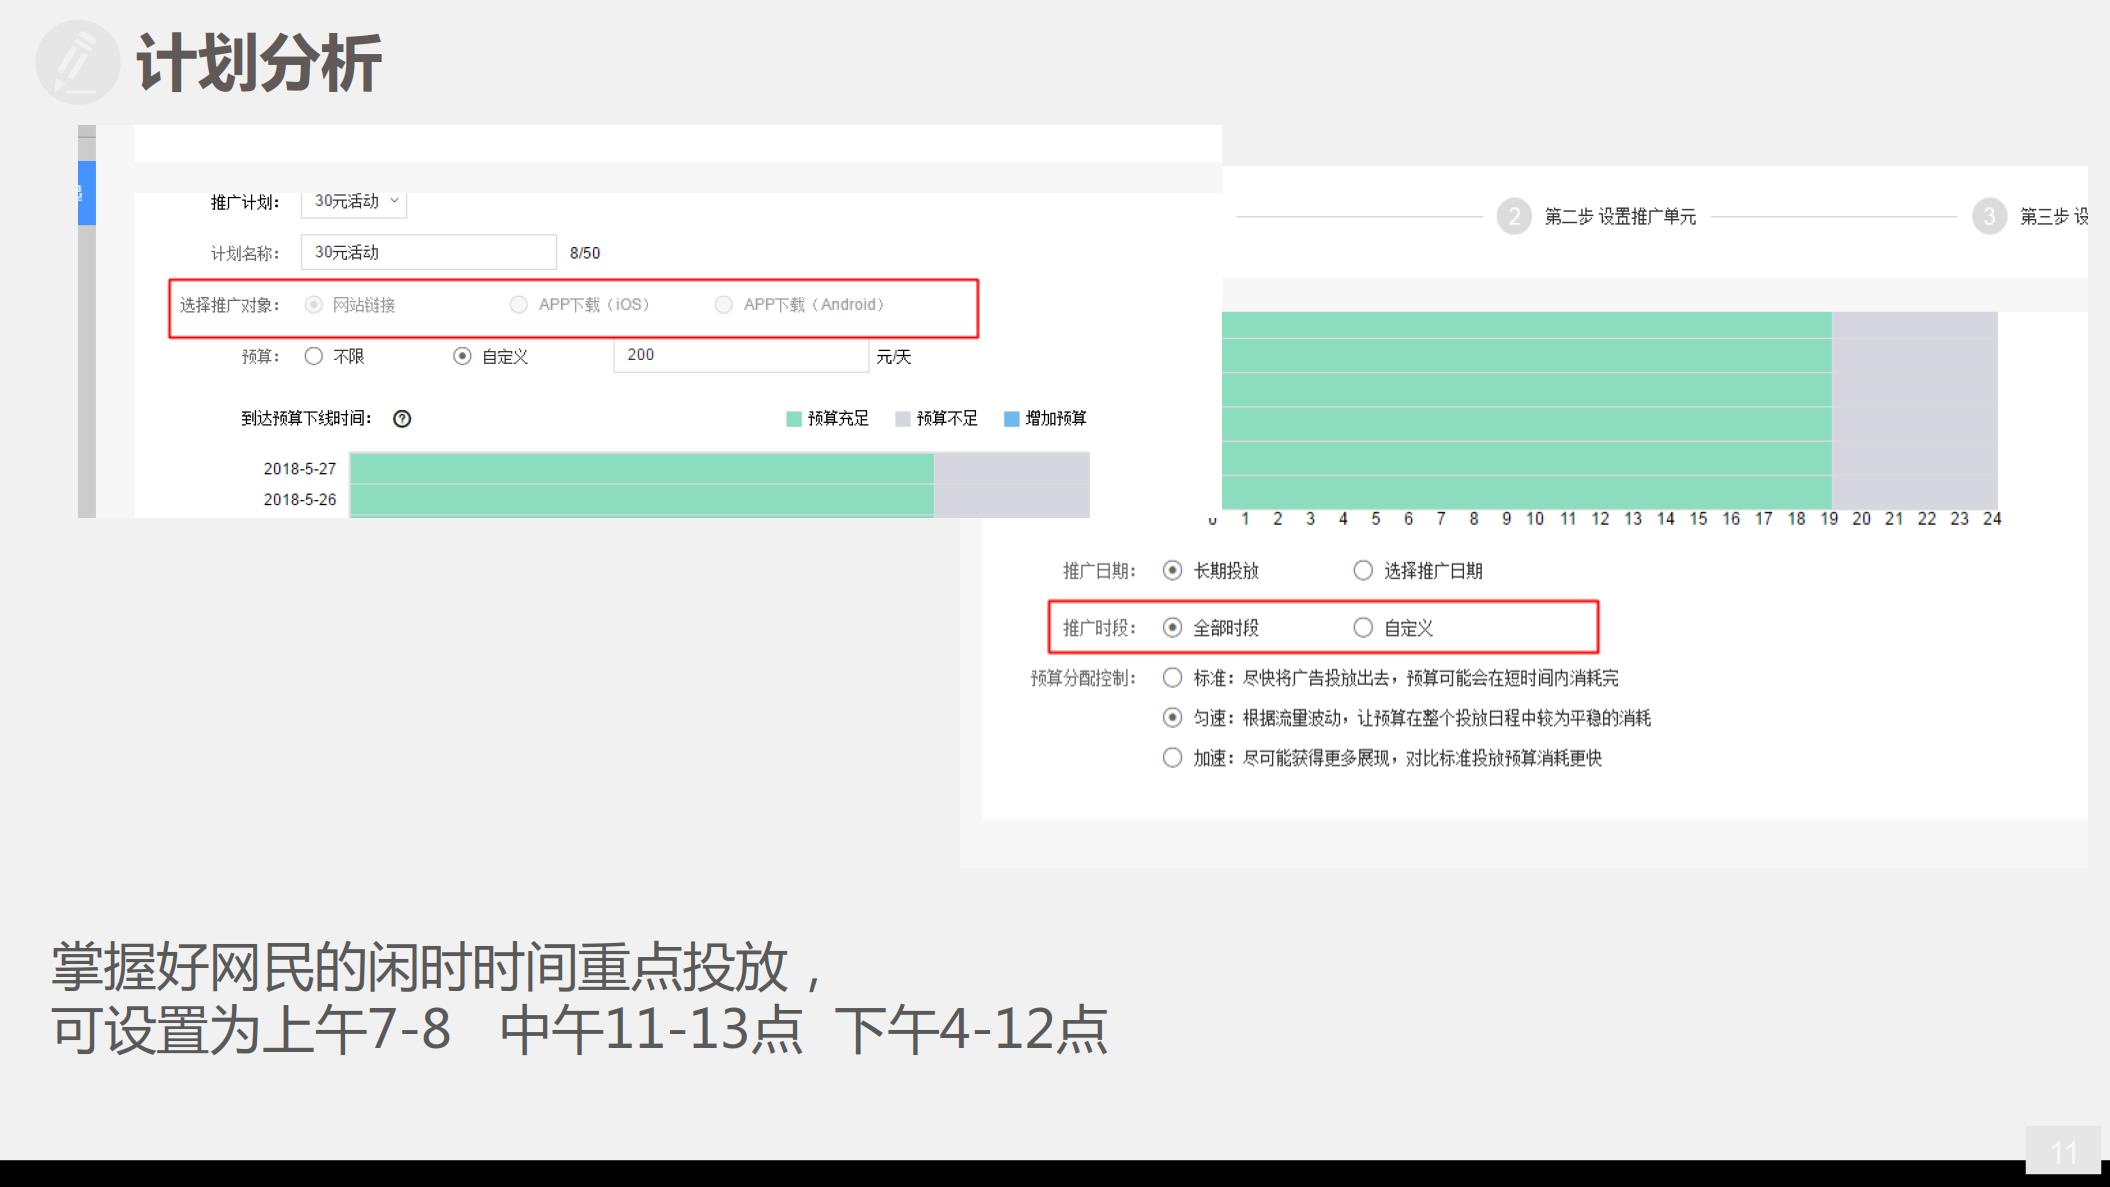 F1+vbj村小爱+软件游戏+张洁0608_11.png